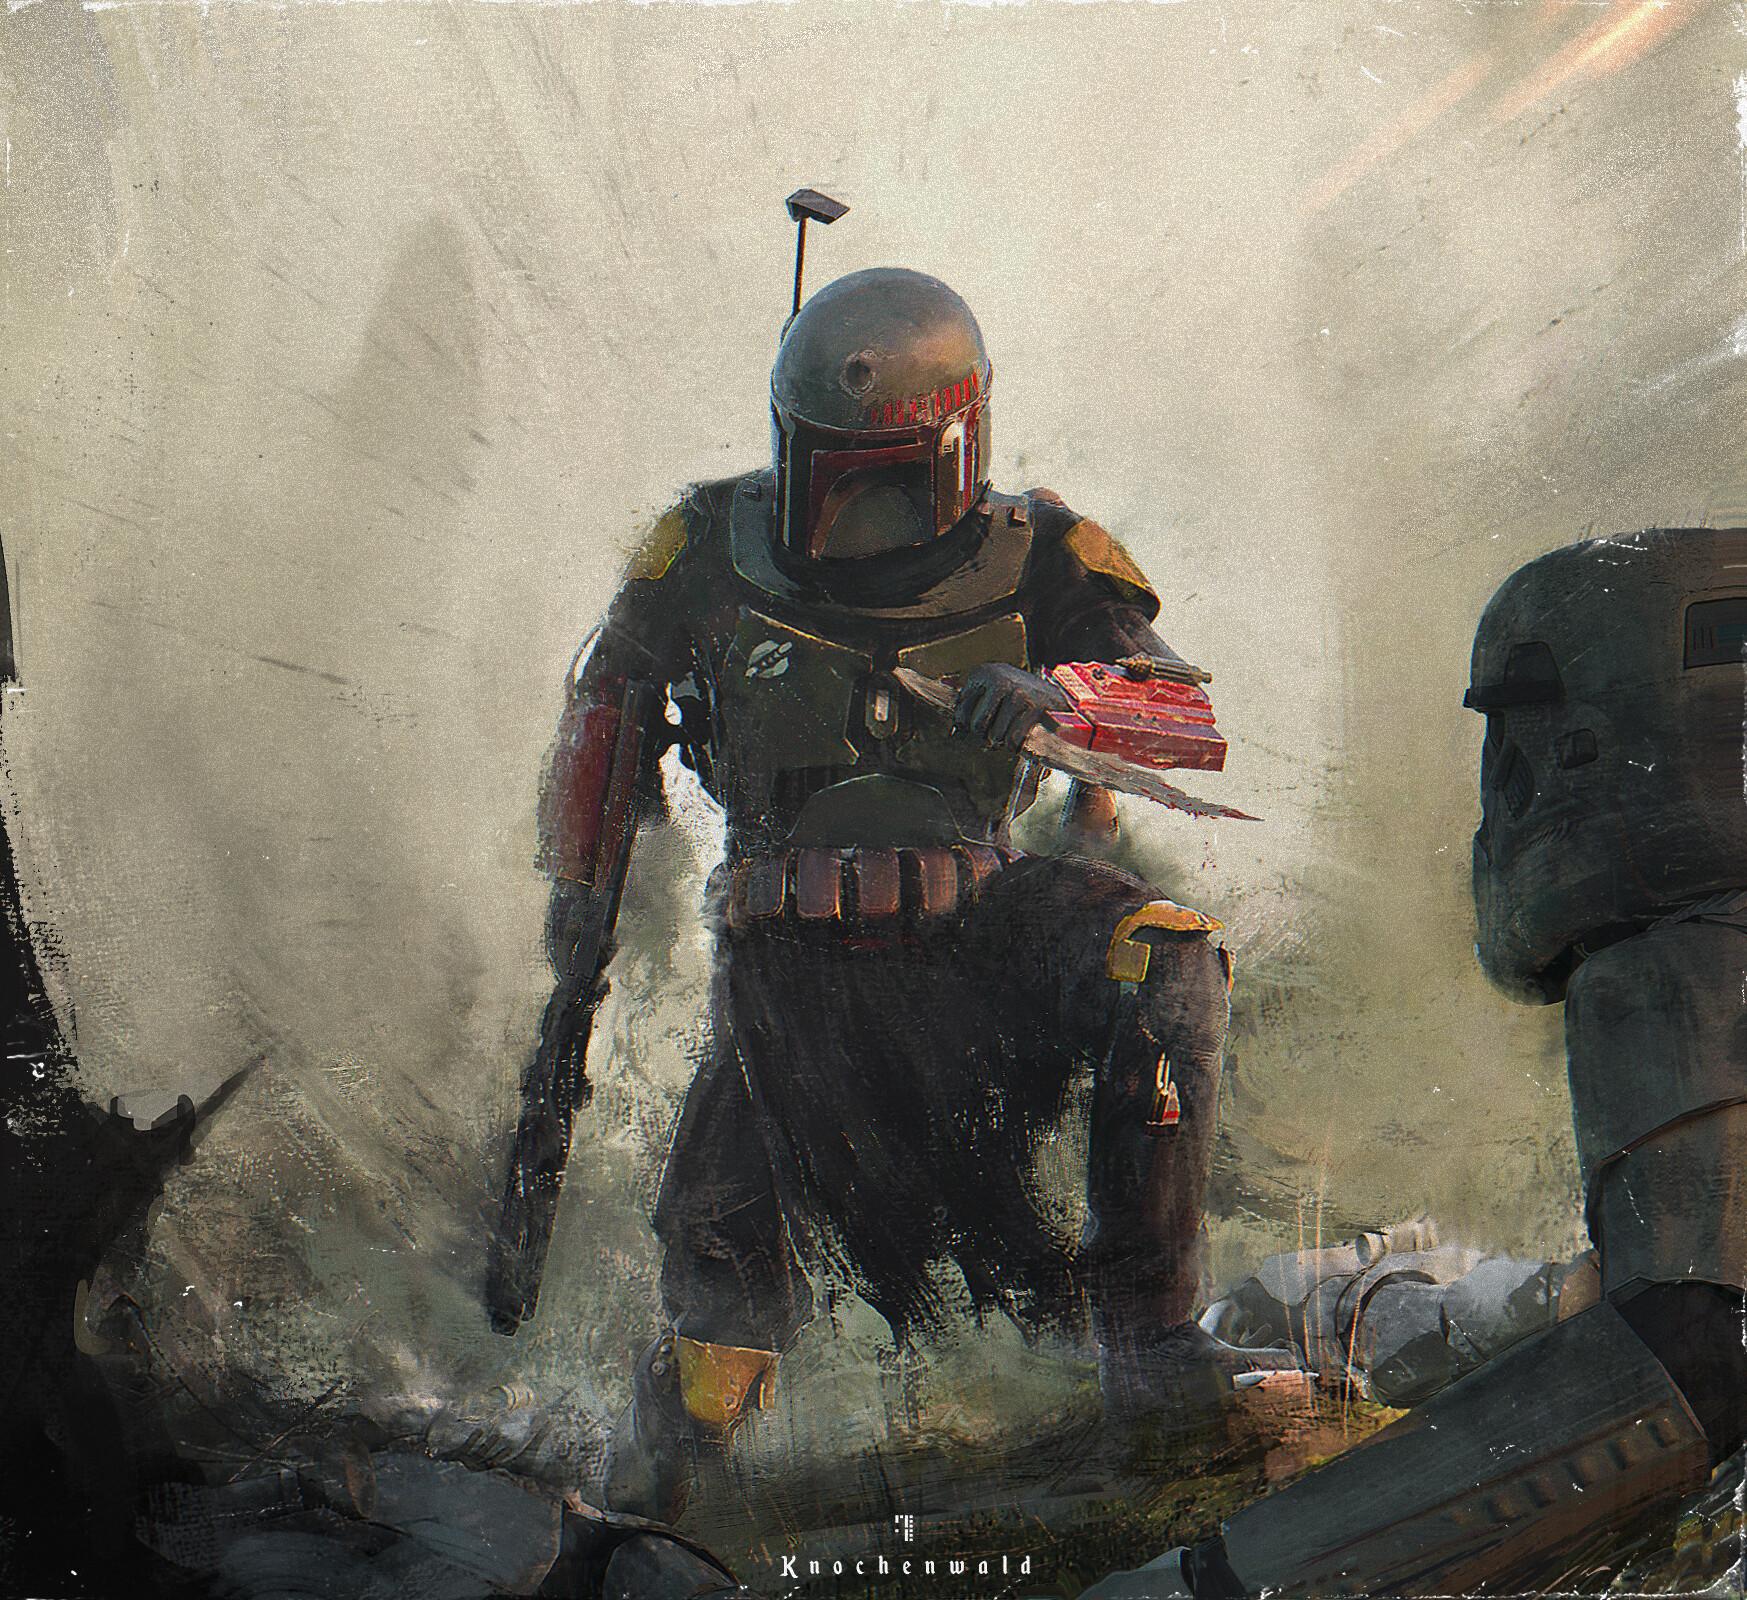 General 1747x1600 Star Wars Boba Fett Star Wars Villains artwork bounty hunter science fiction The Mandalorian